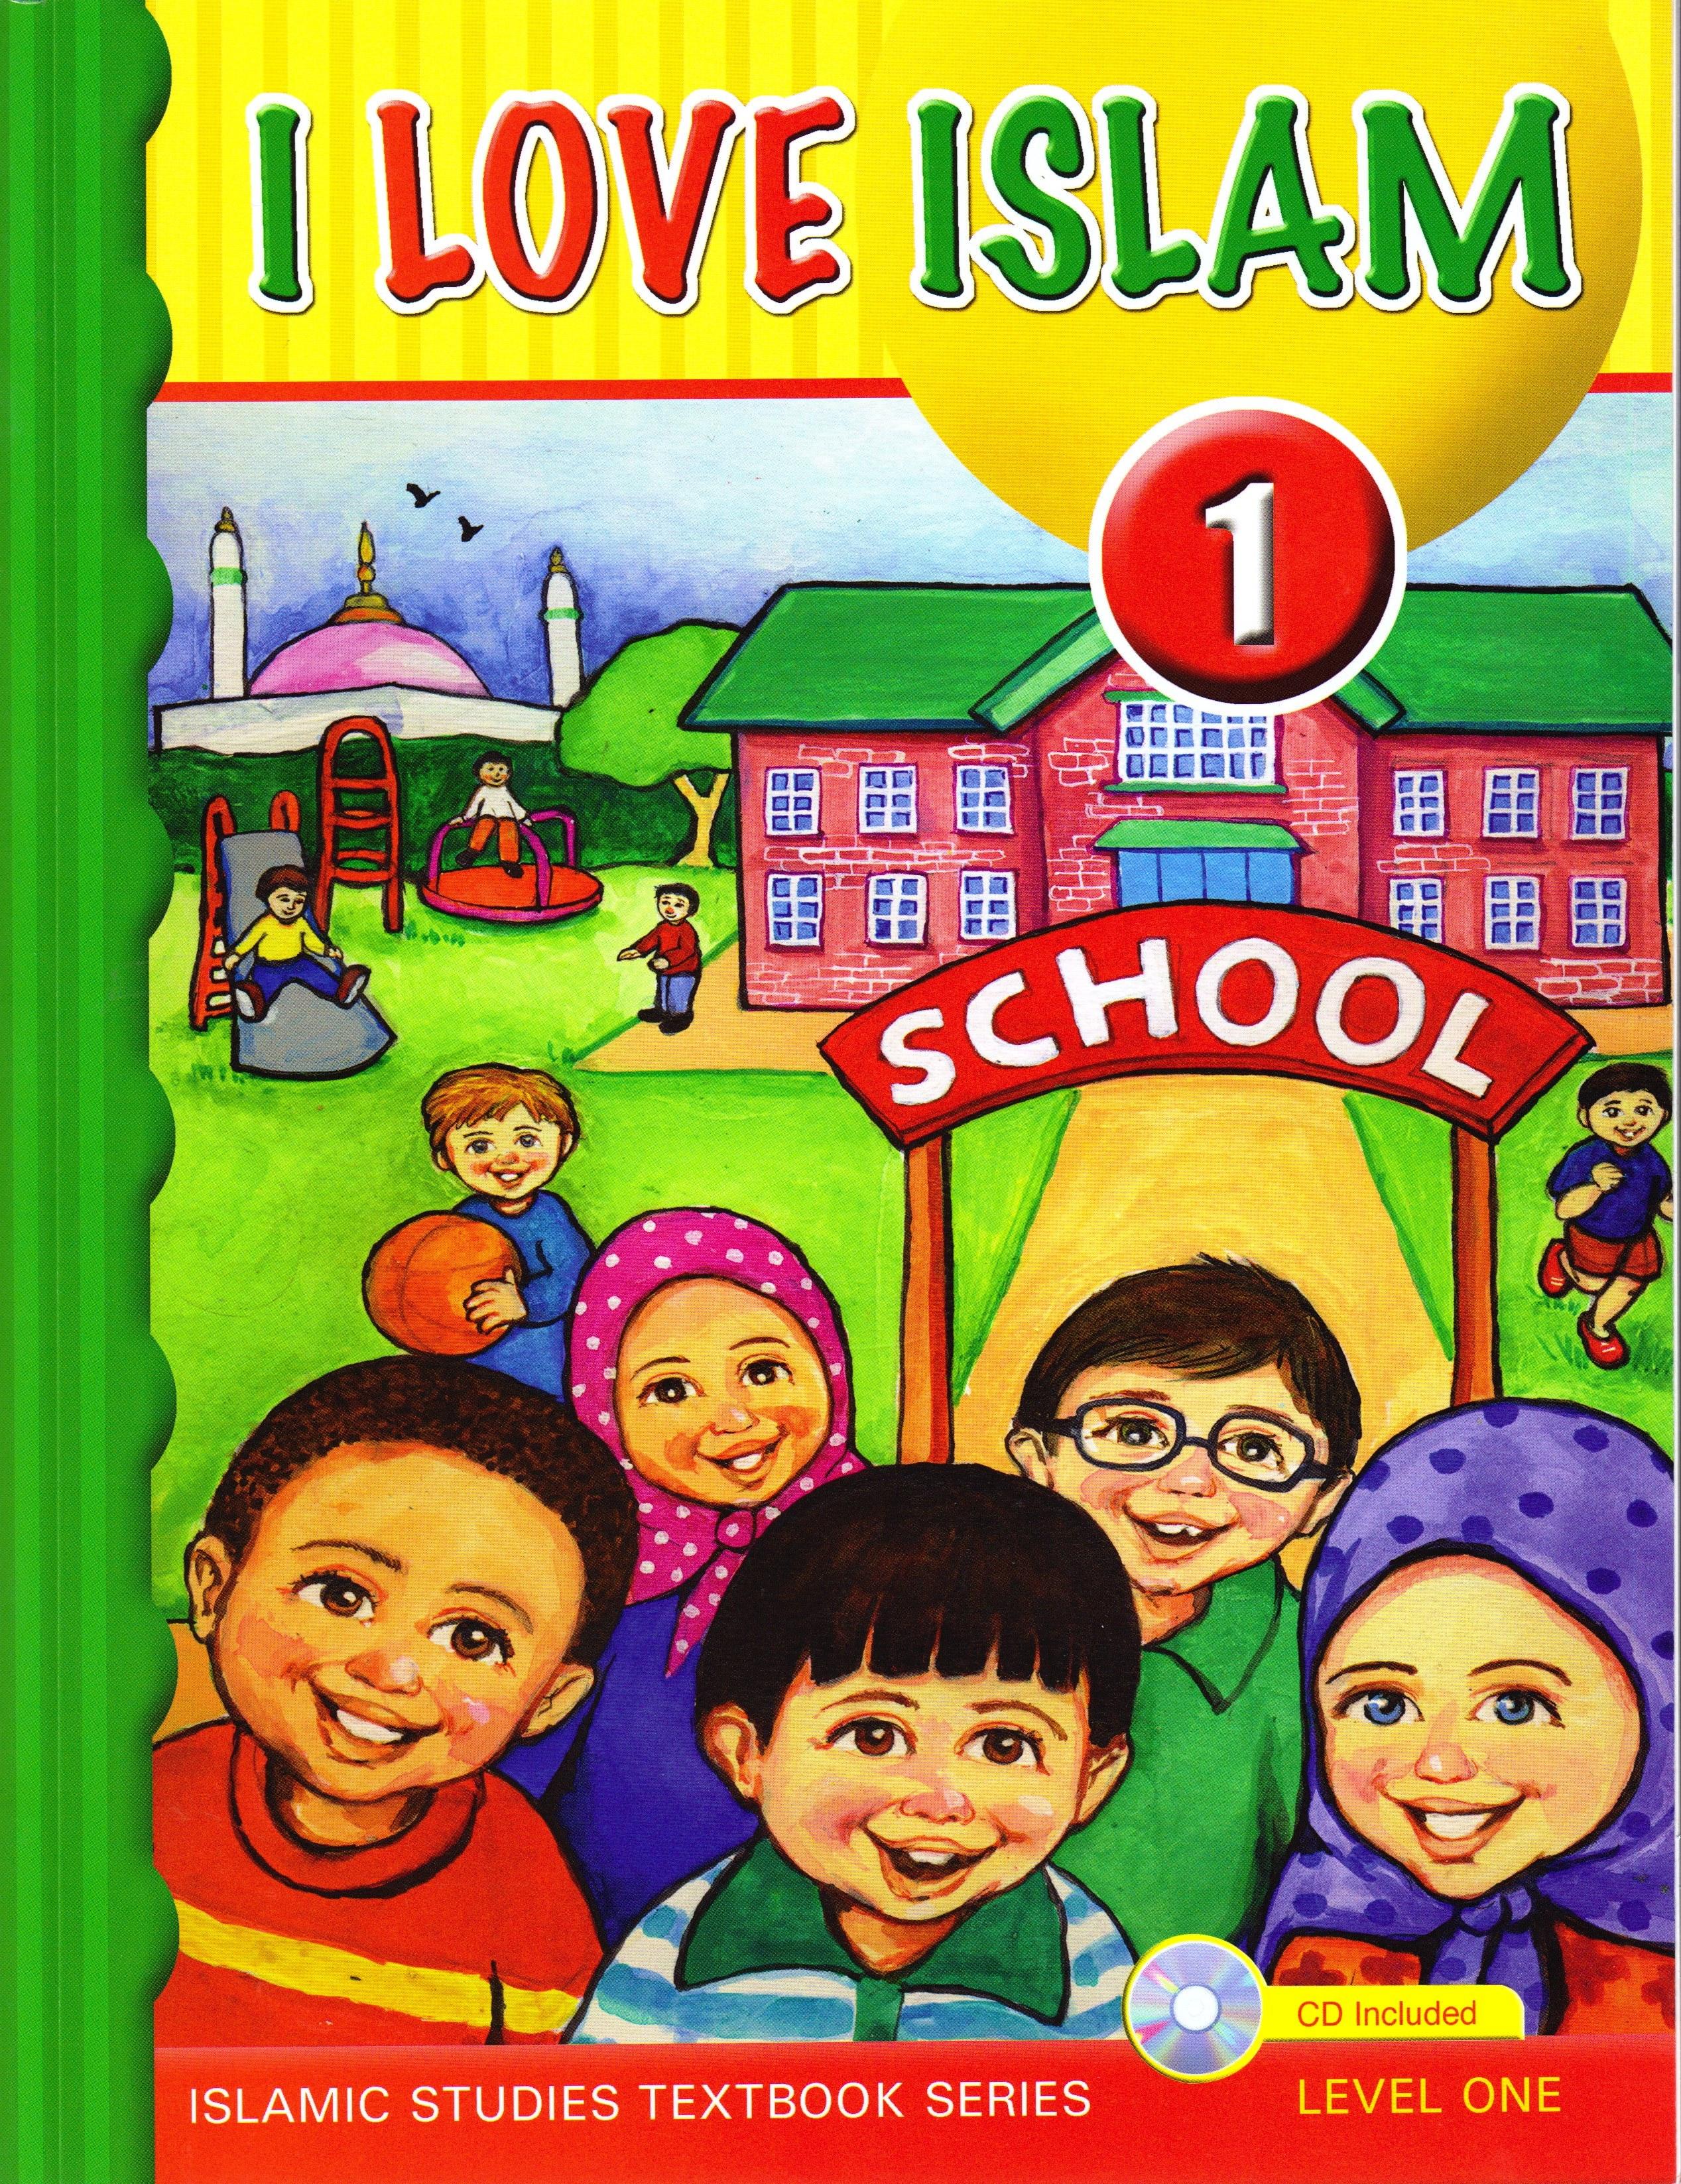 I Love Islam: Level 1 Textbook & CD